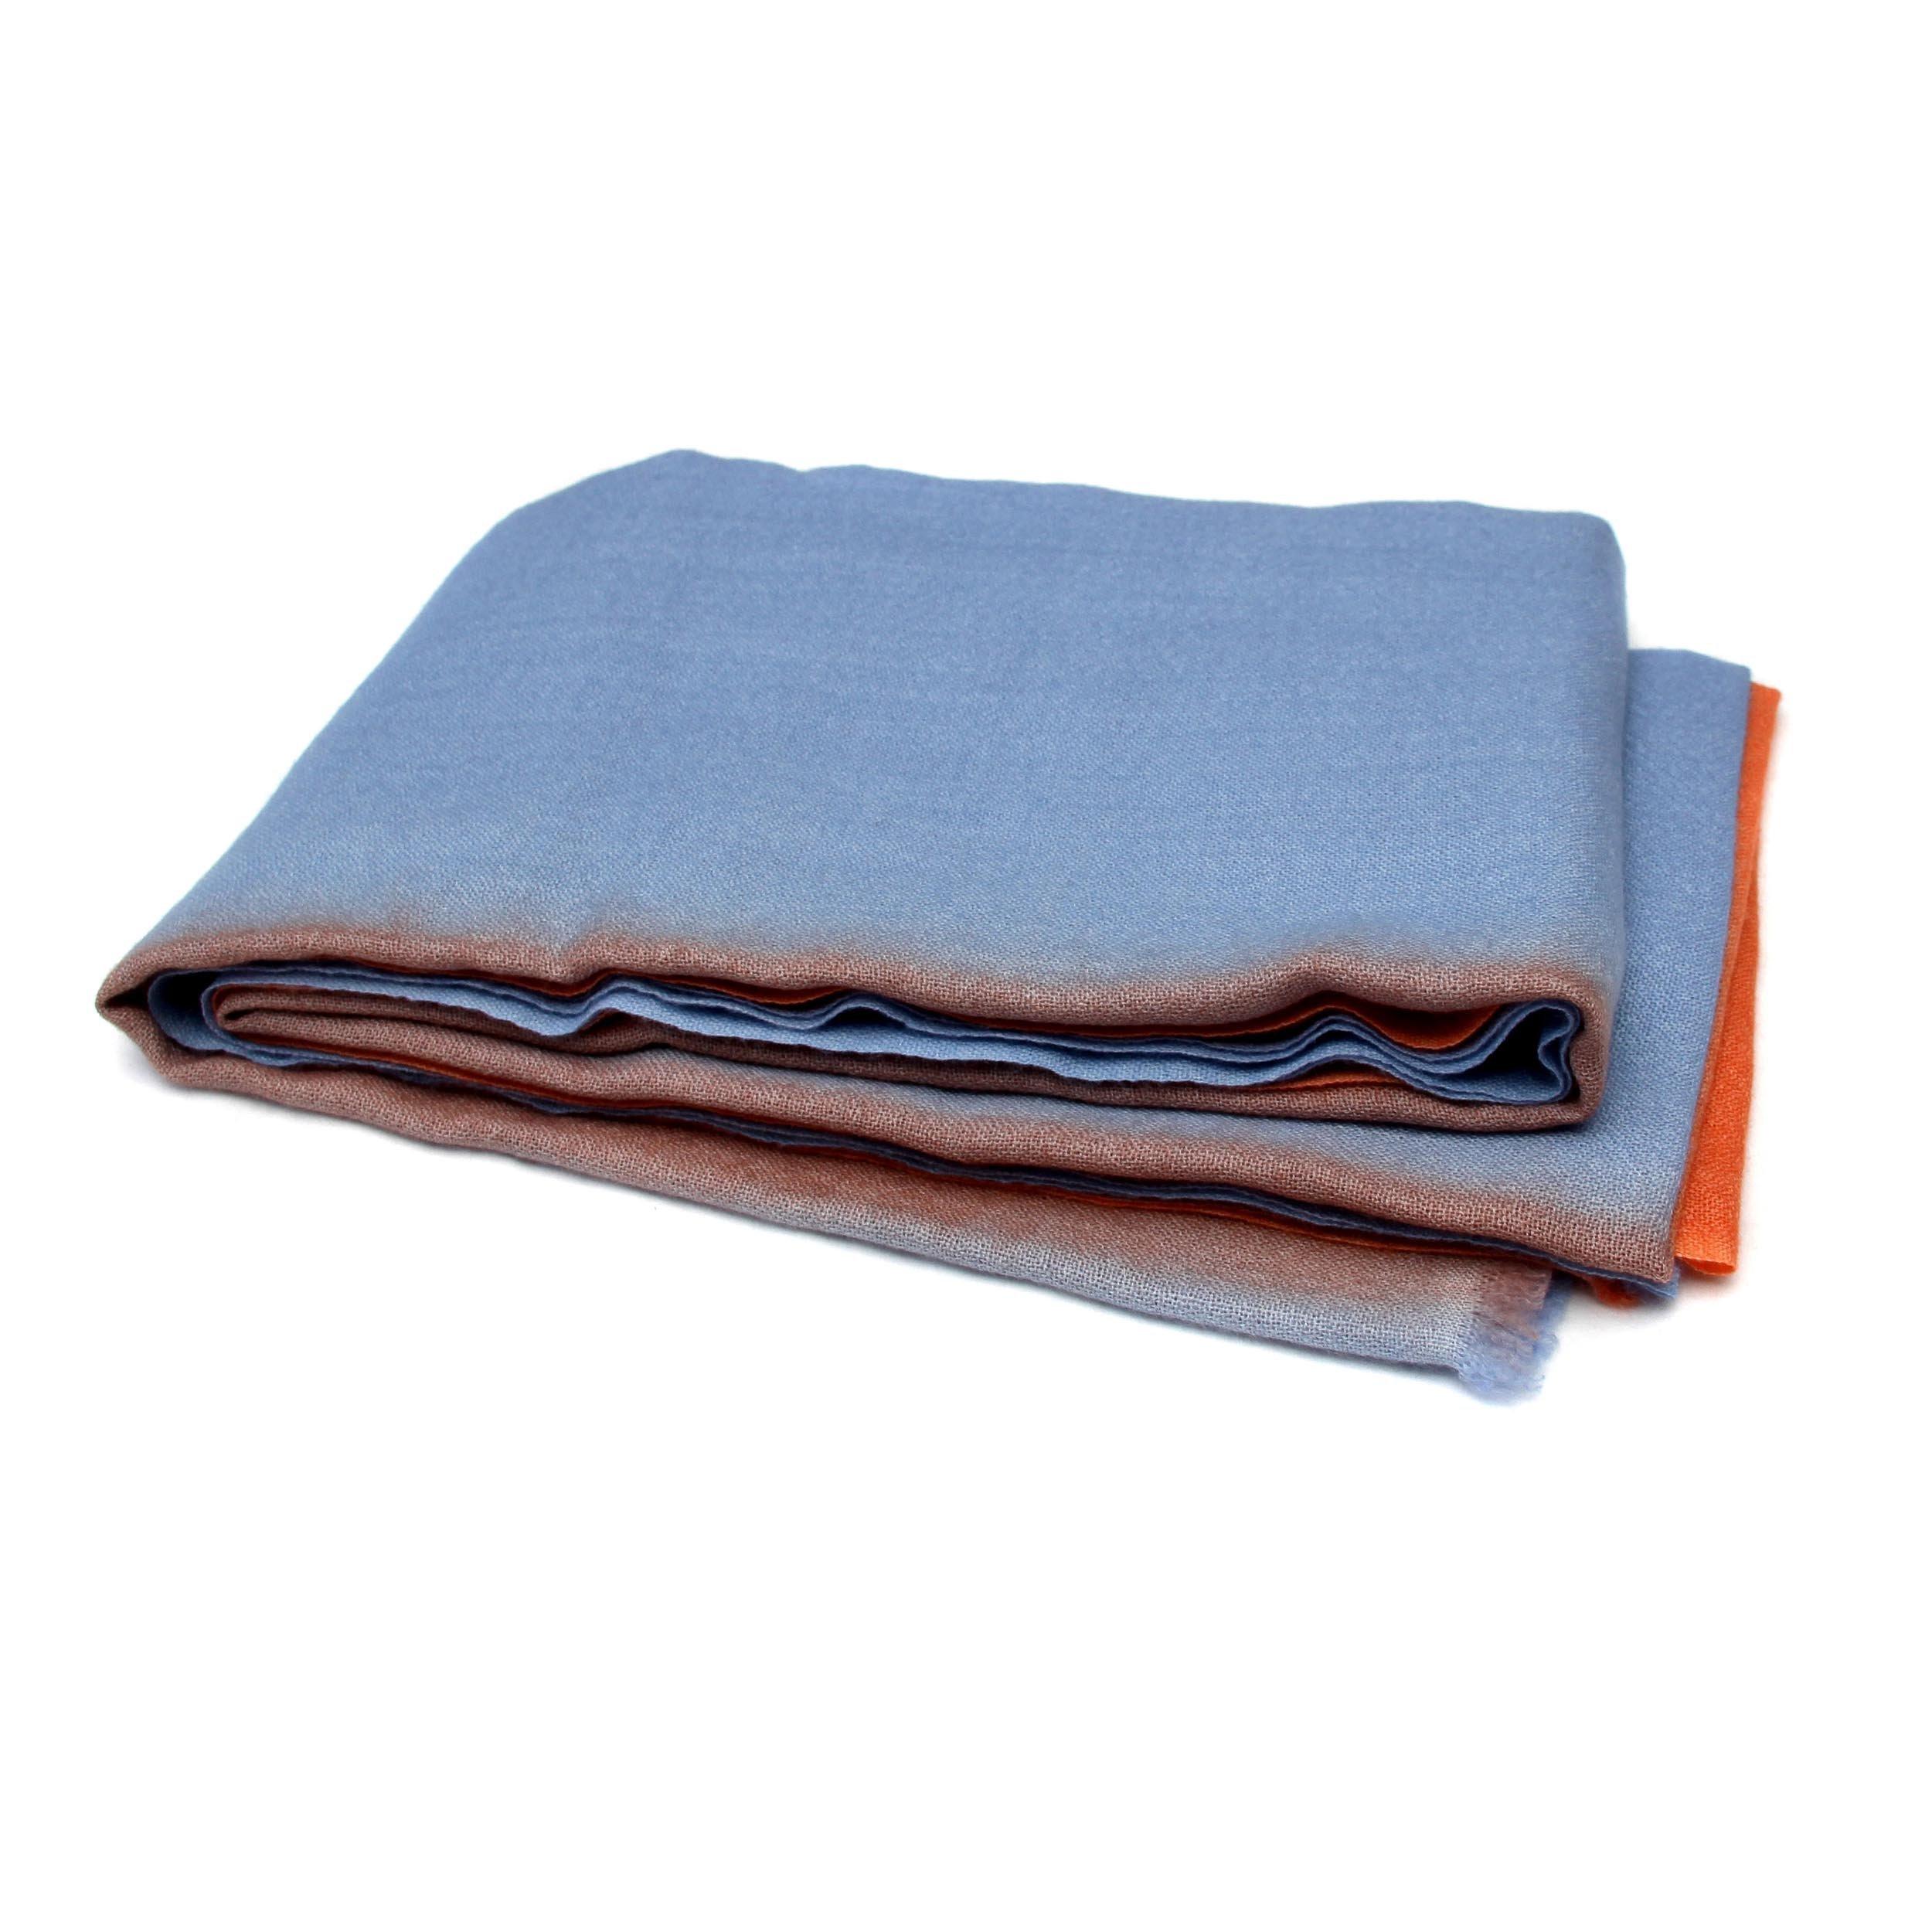 100% Cashmere Ombre Stole, (100/2 Mongolian Yarn Composition) Blue and Orange Ombre Lightweight Stole, Light Brown border © Moksha Cashmere